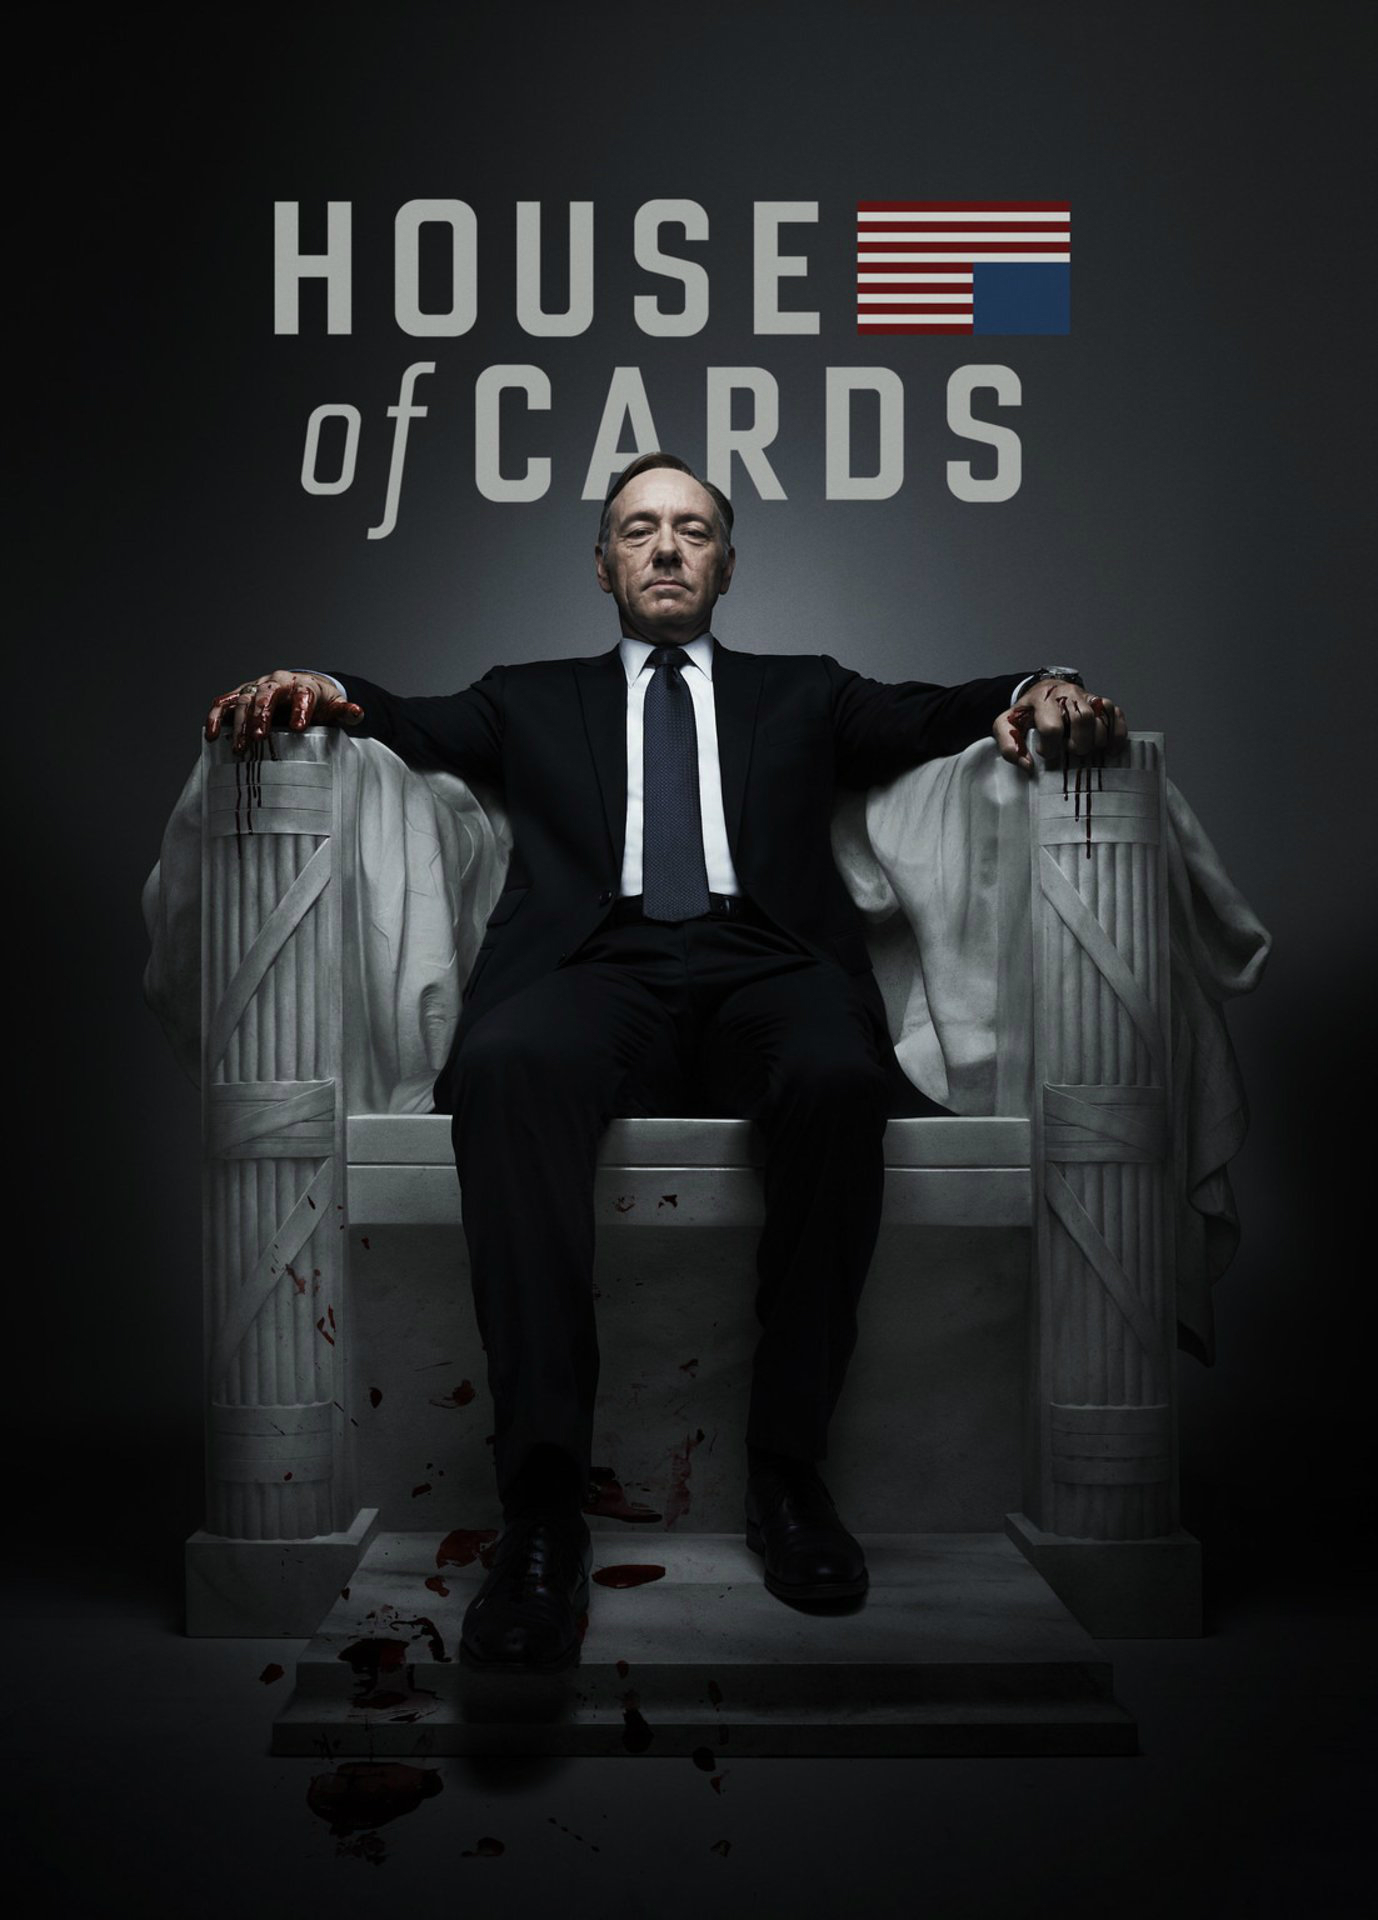 House of Cards Serie · Stream · Streaminganbieter ·